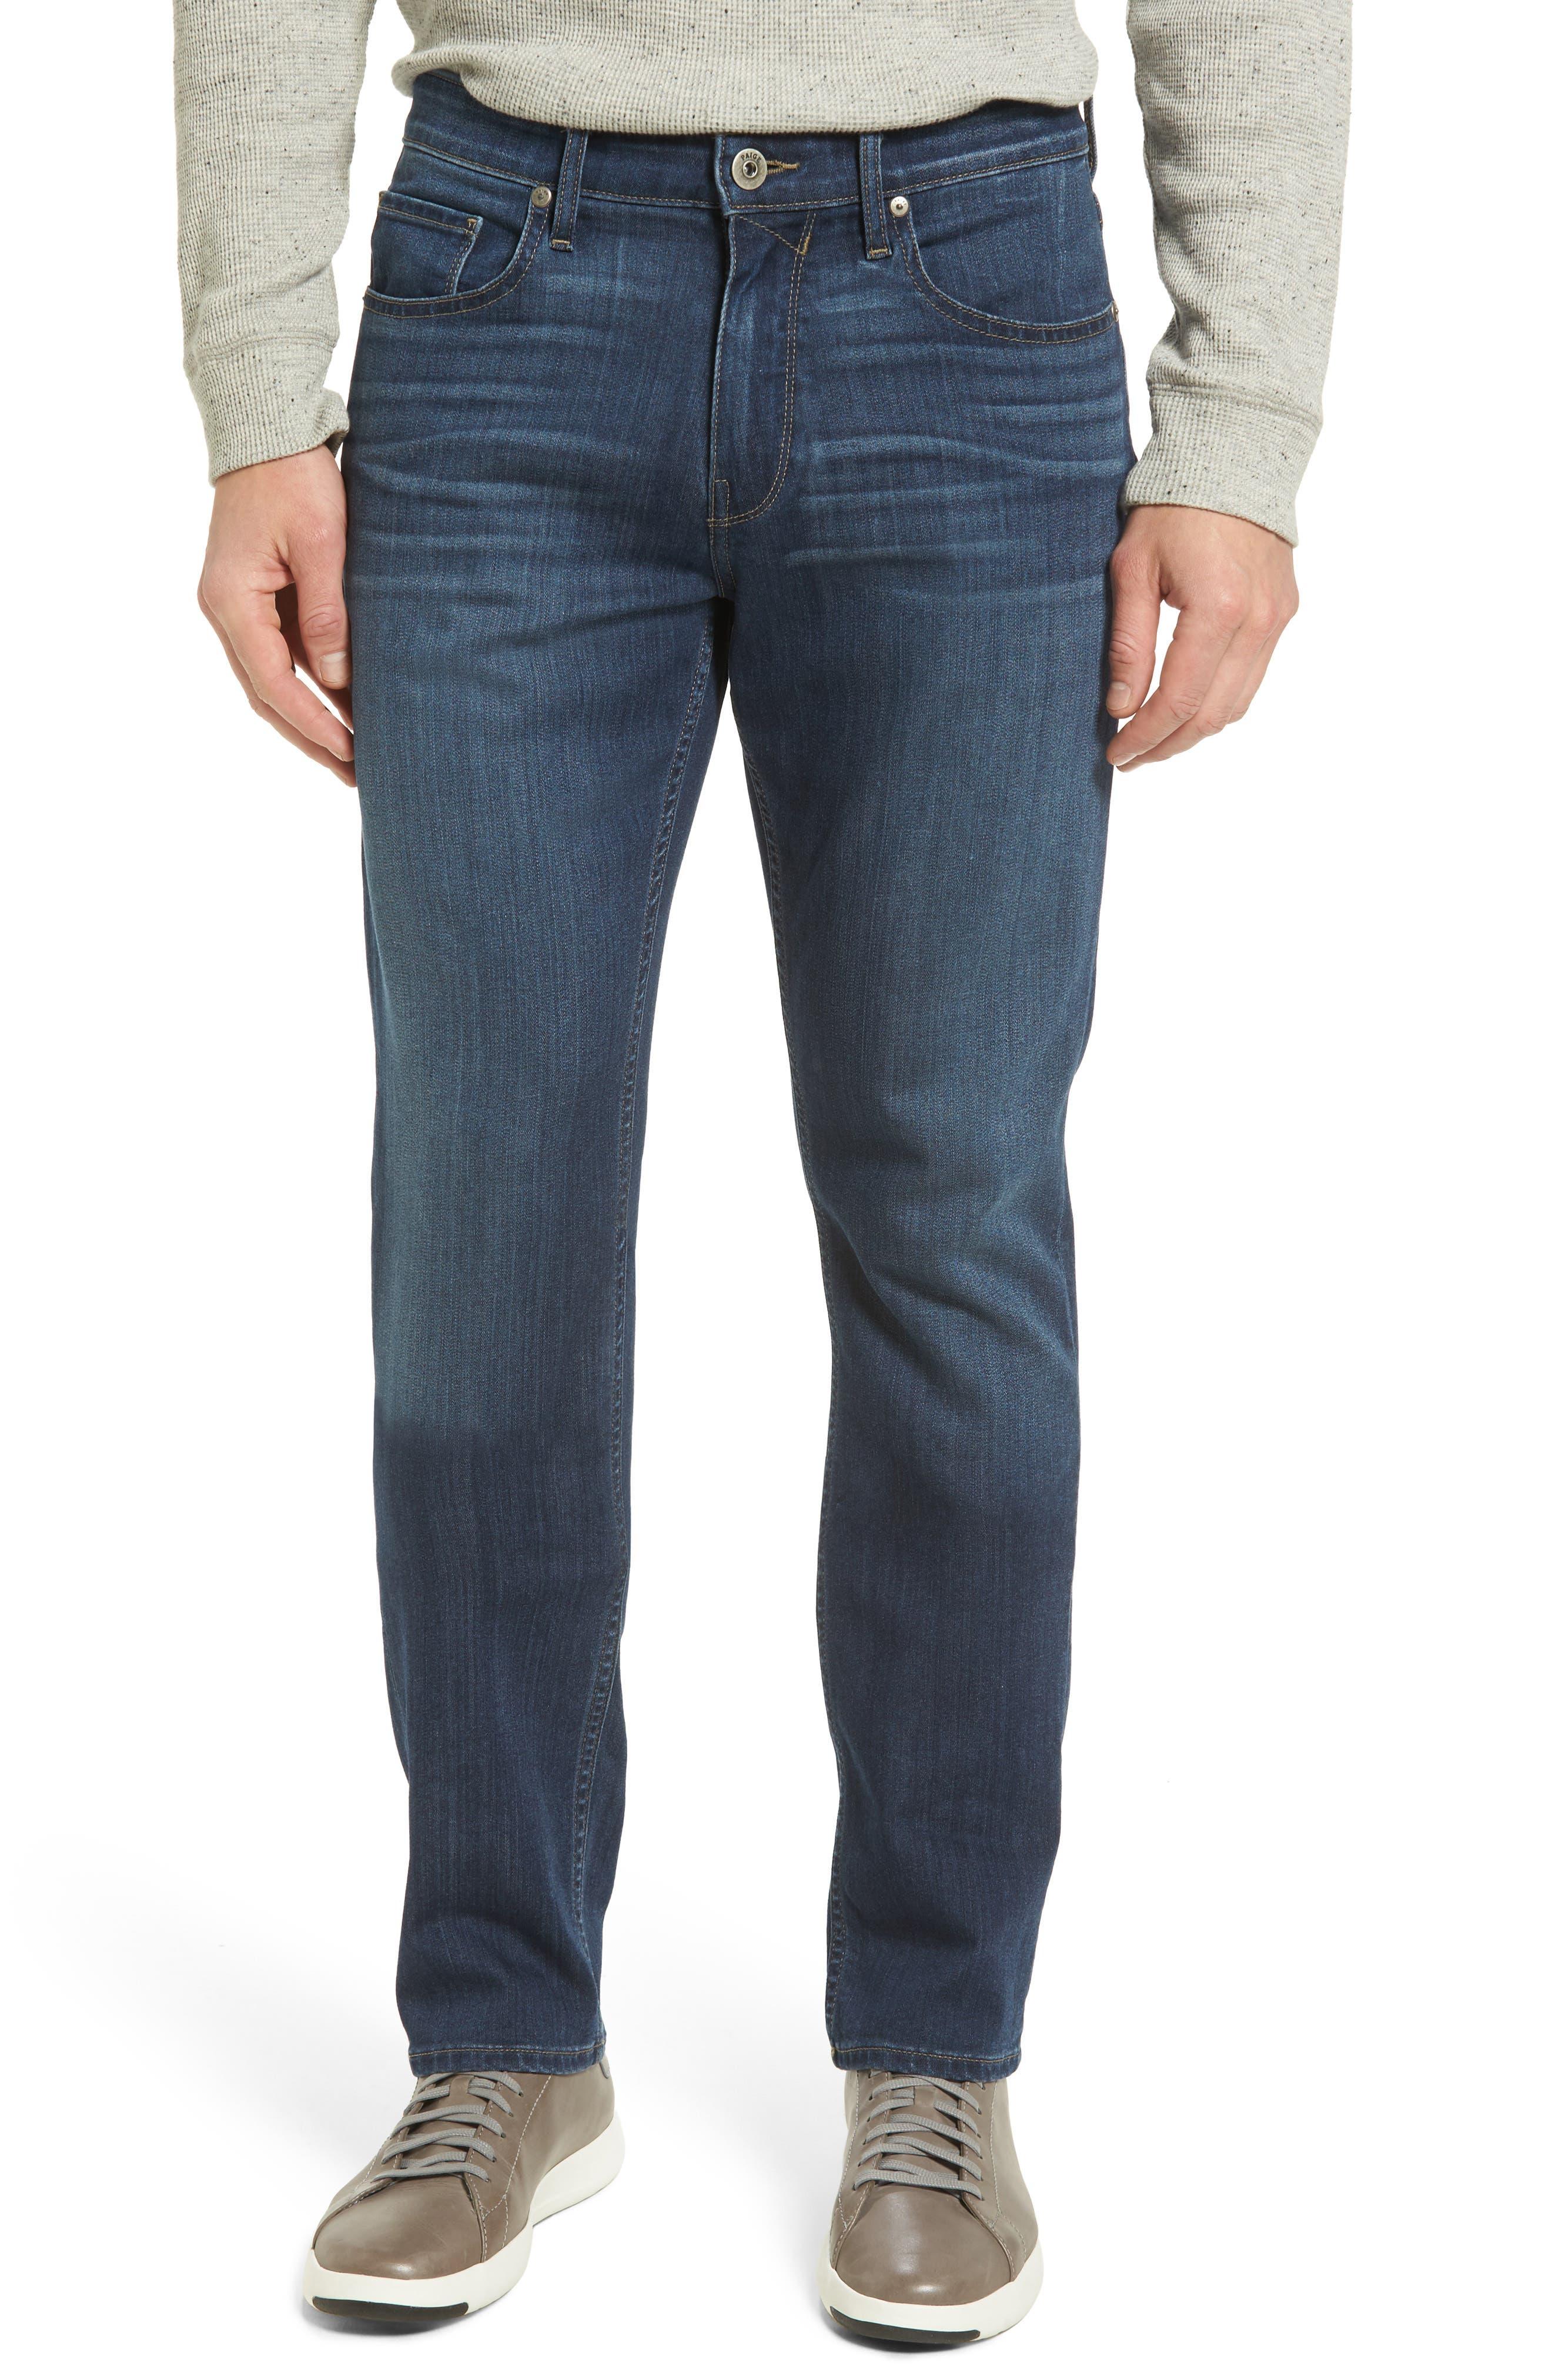 PAIGE Transcend - Federal Slim Straight Leg Jeans (Gannon)